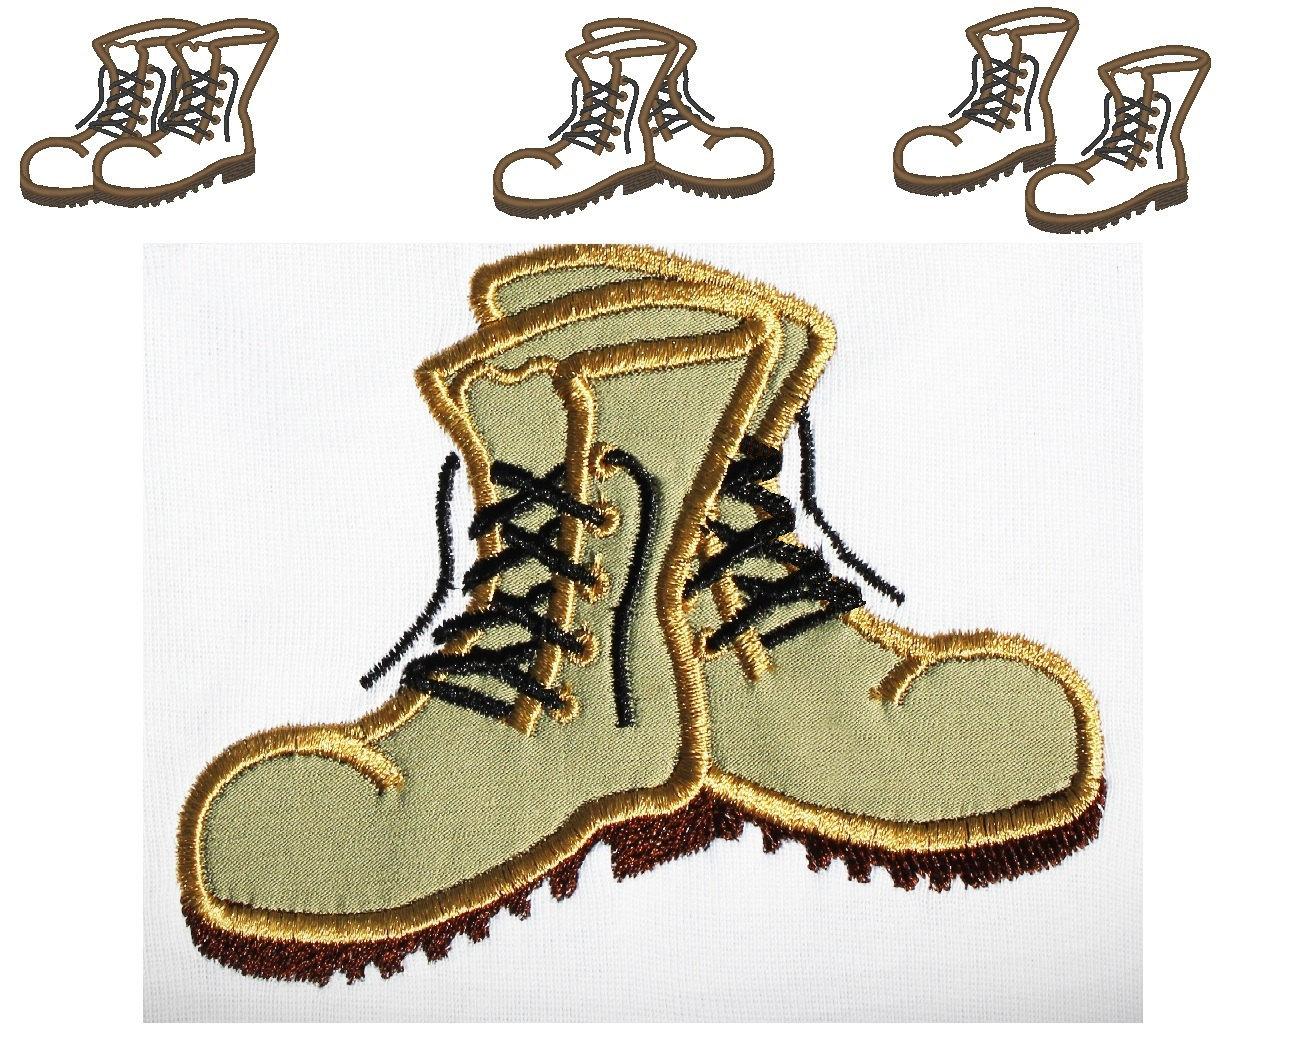 Combat boot clip art pictures.